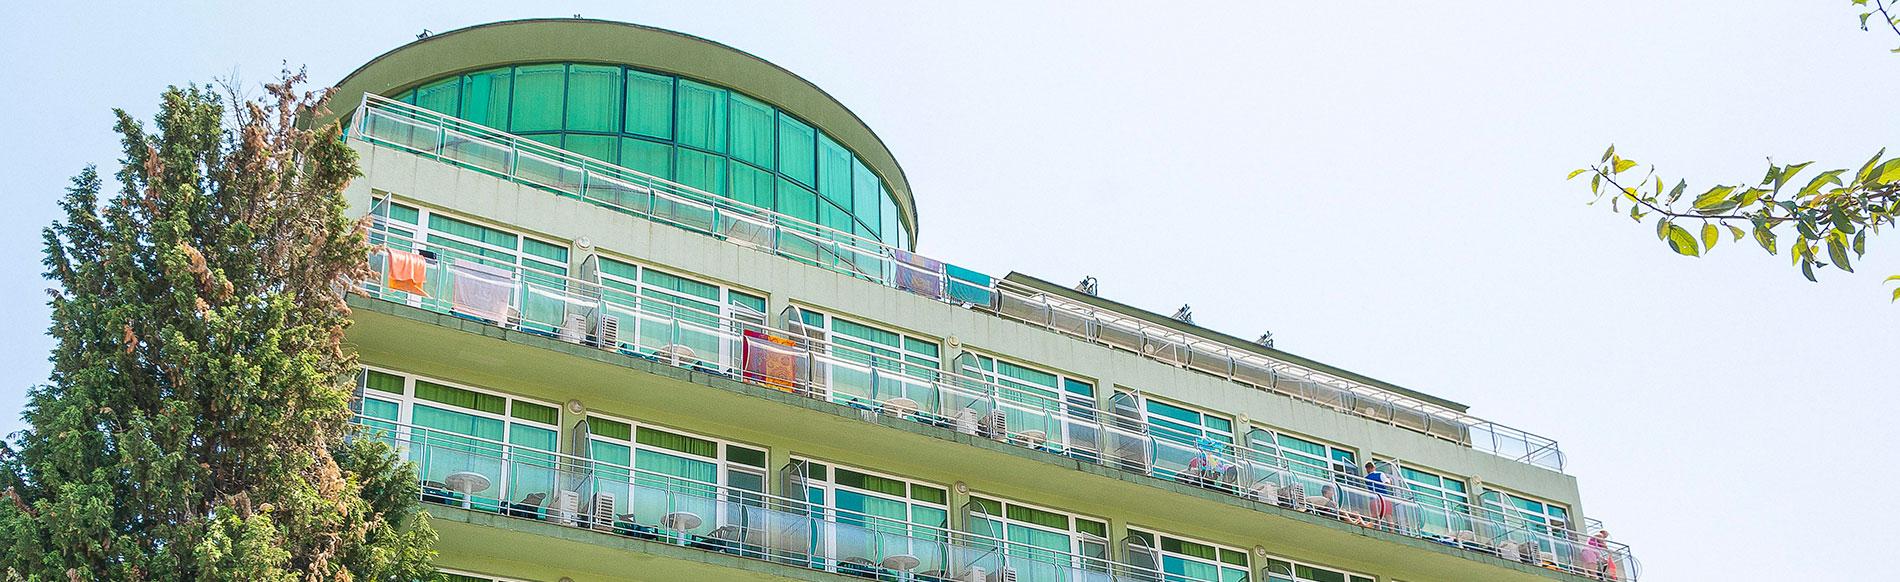 MPM Hotel Boomerang